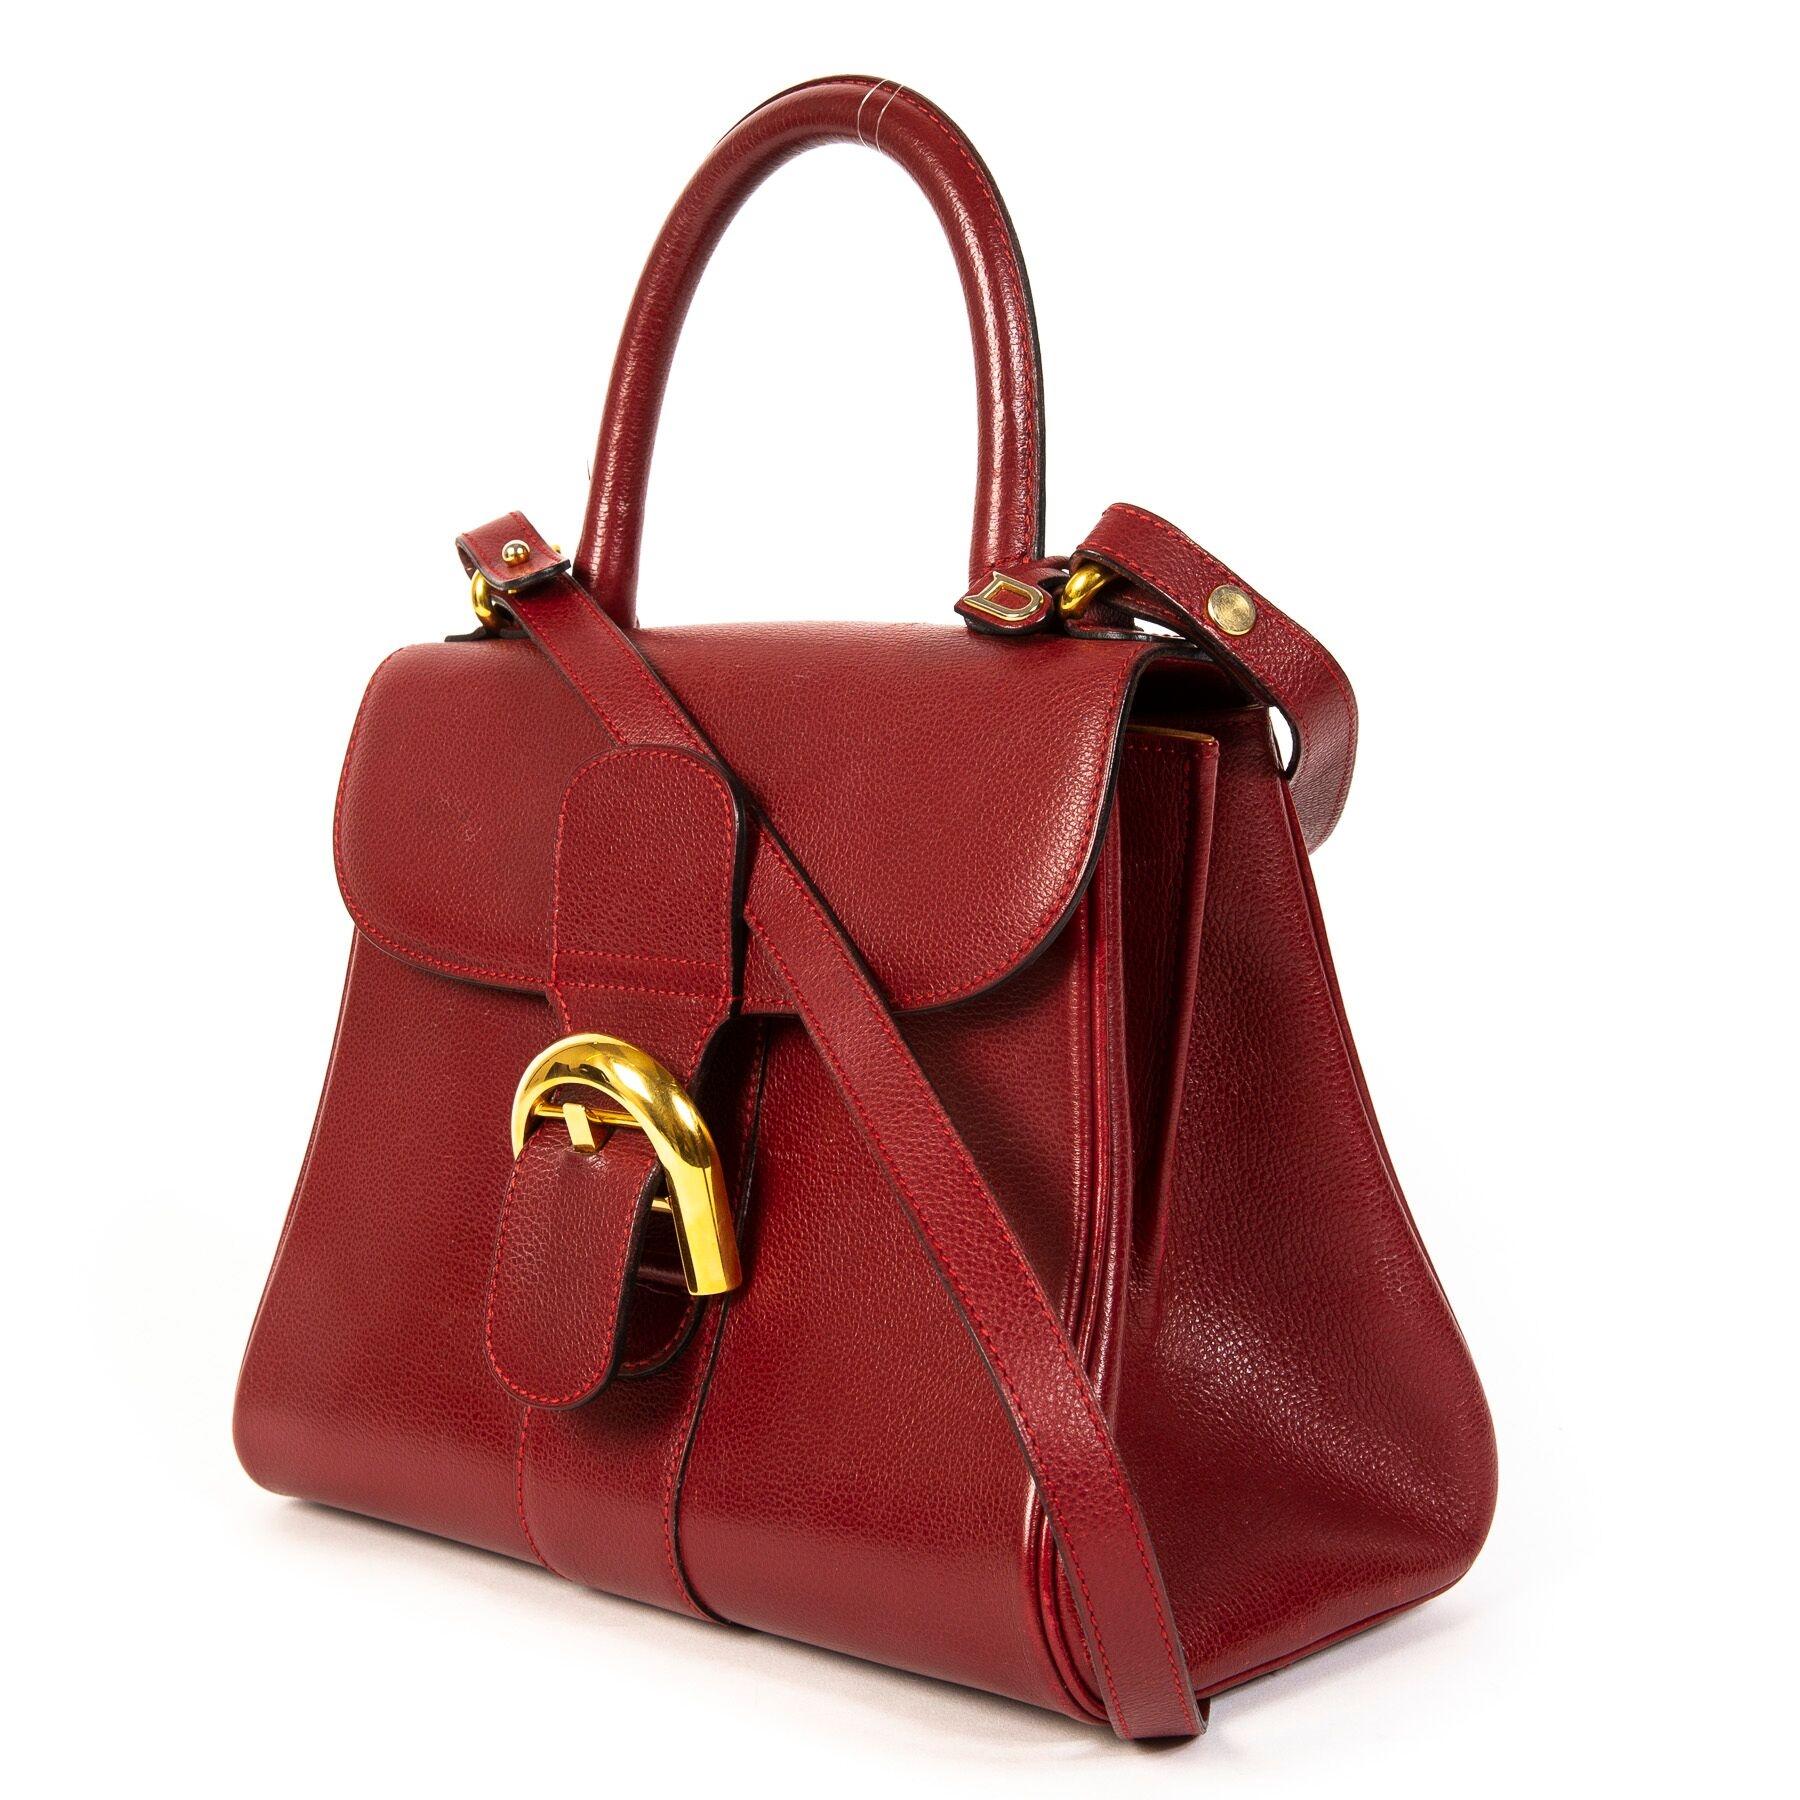 Buy iconic famous Brillant Delvaux bag at LabelLOV, original secondhand. Safe payment.